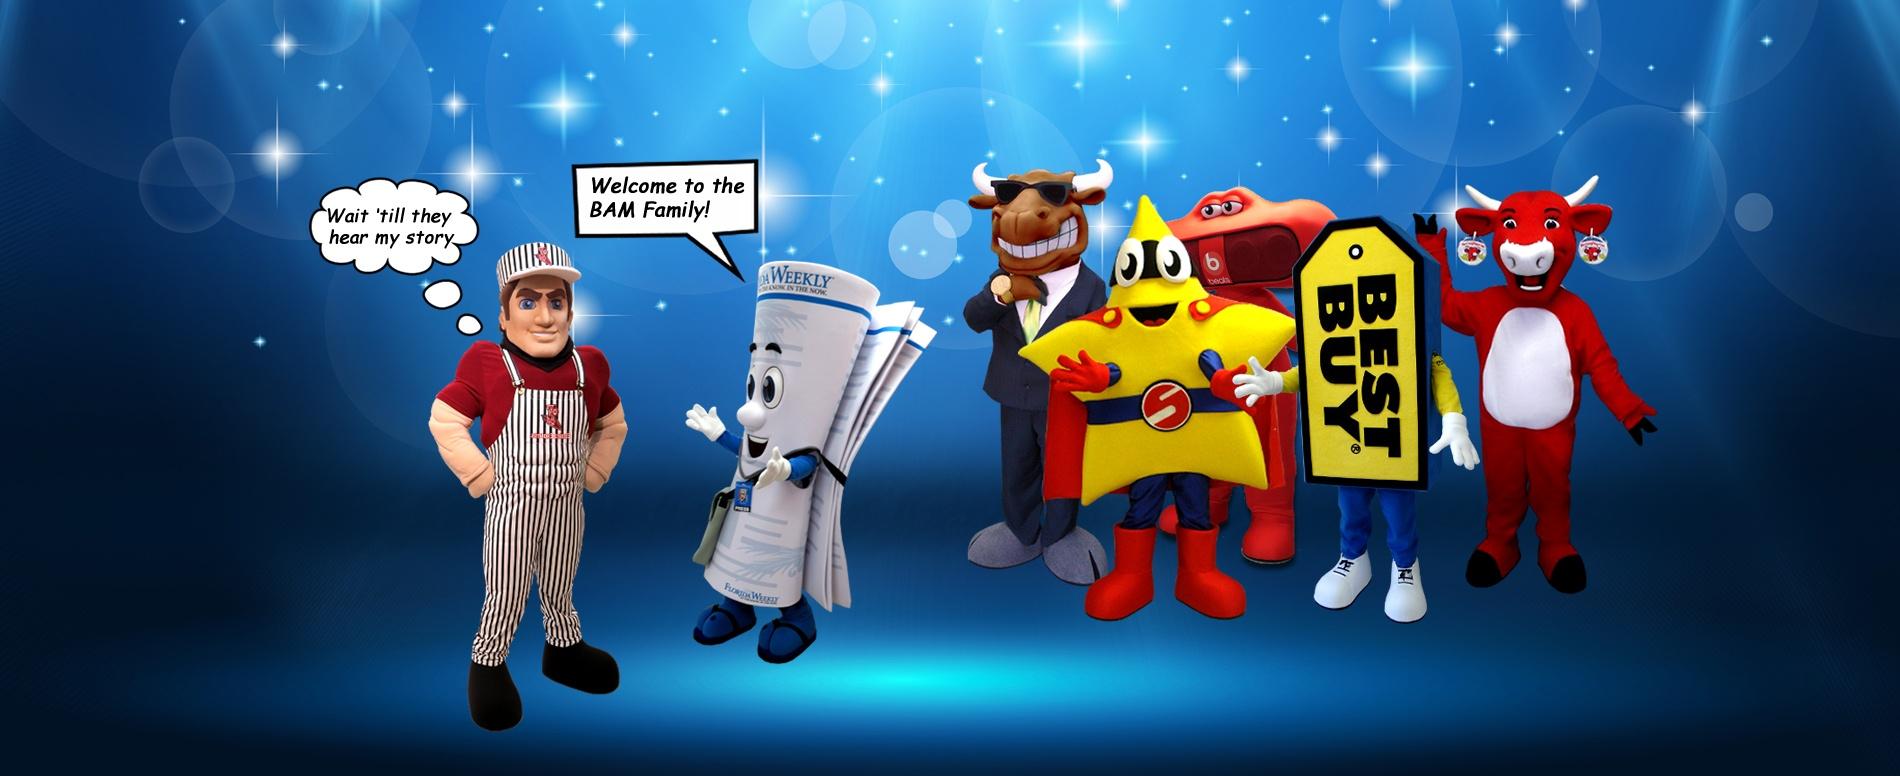 BAM! Mascots - Custom Mascot Makers & Designers